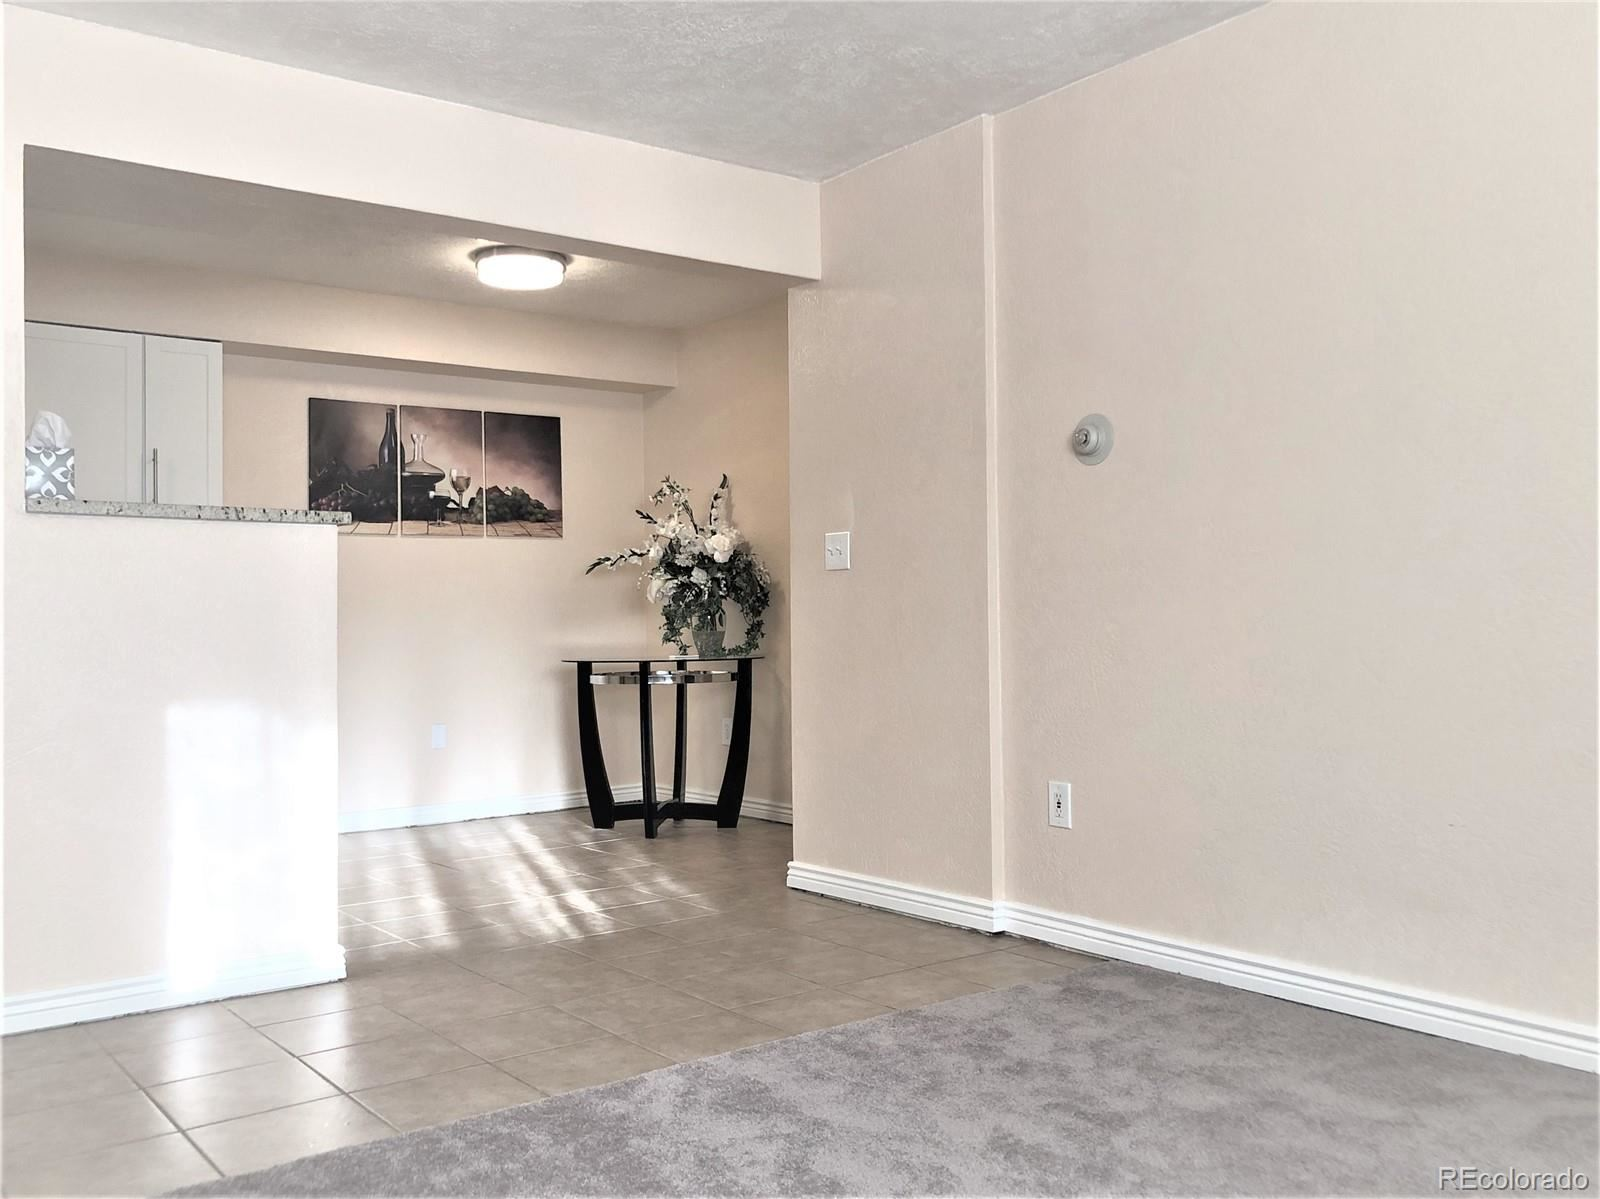 381 S Ames Street #C102, Lakewood, CO 80226 - #: 6043448